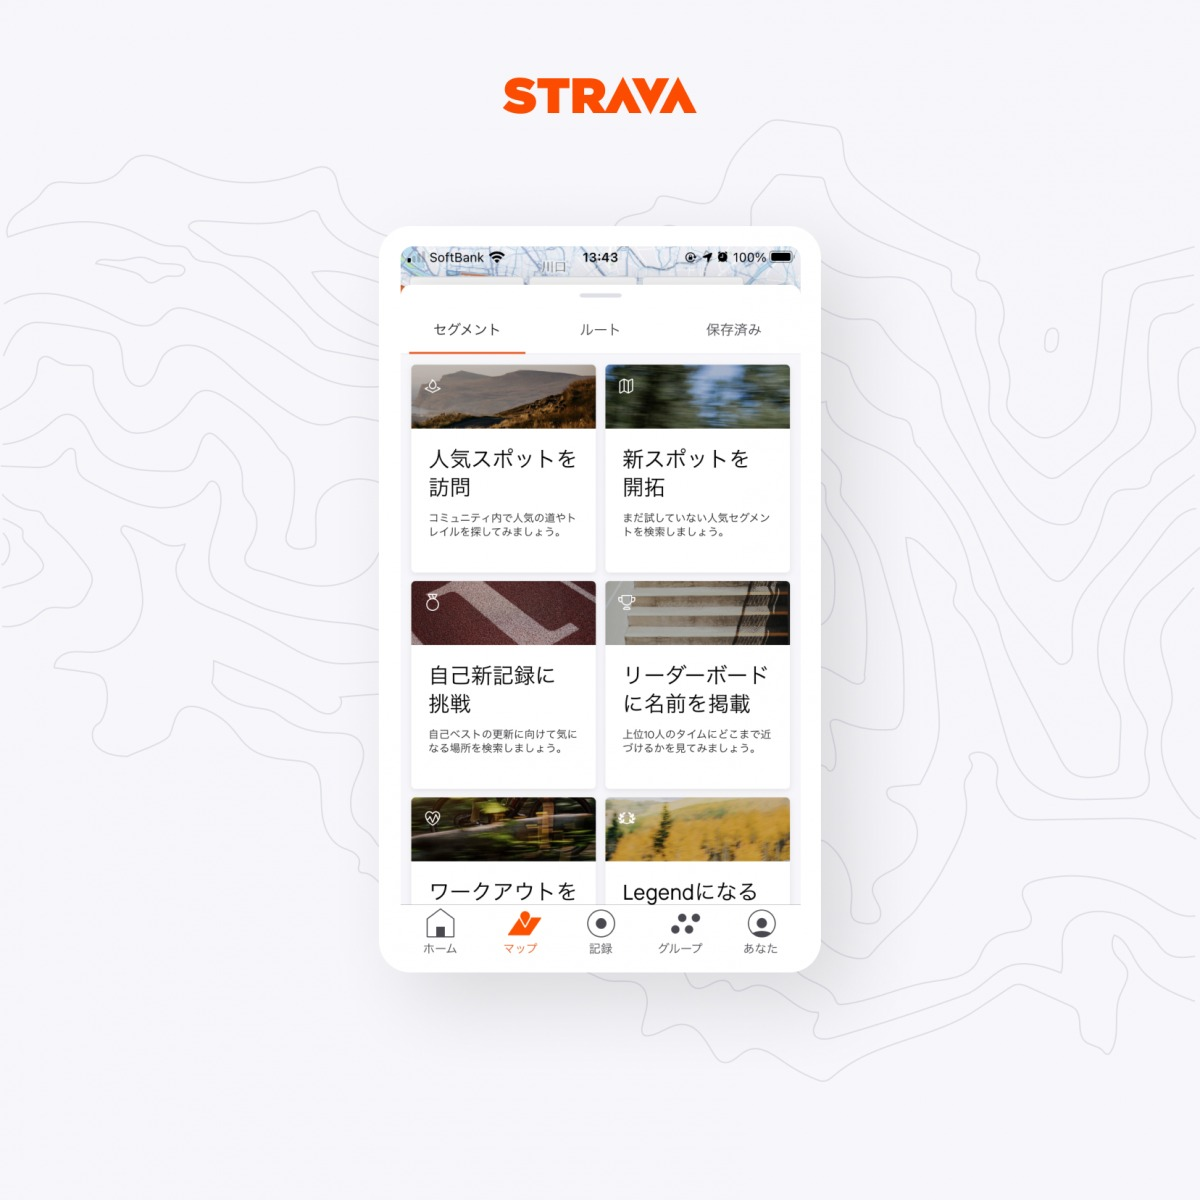 「Stravaが新機能「グループチャレンジ」を発表!仲間と繋がりモチベーションアップに」の画像